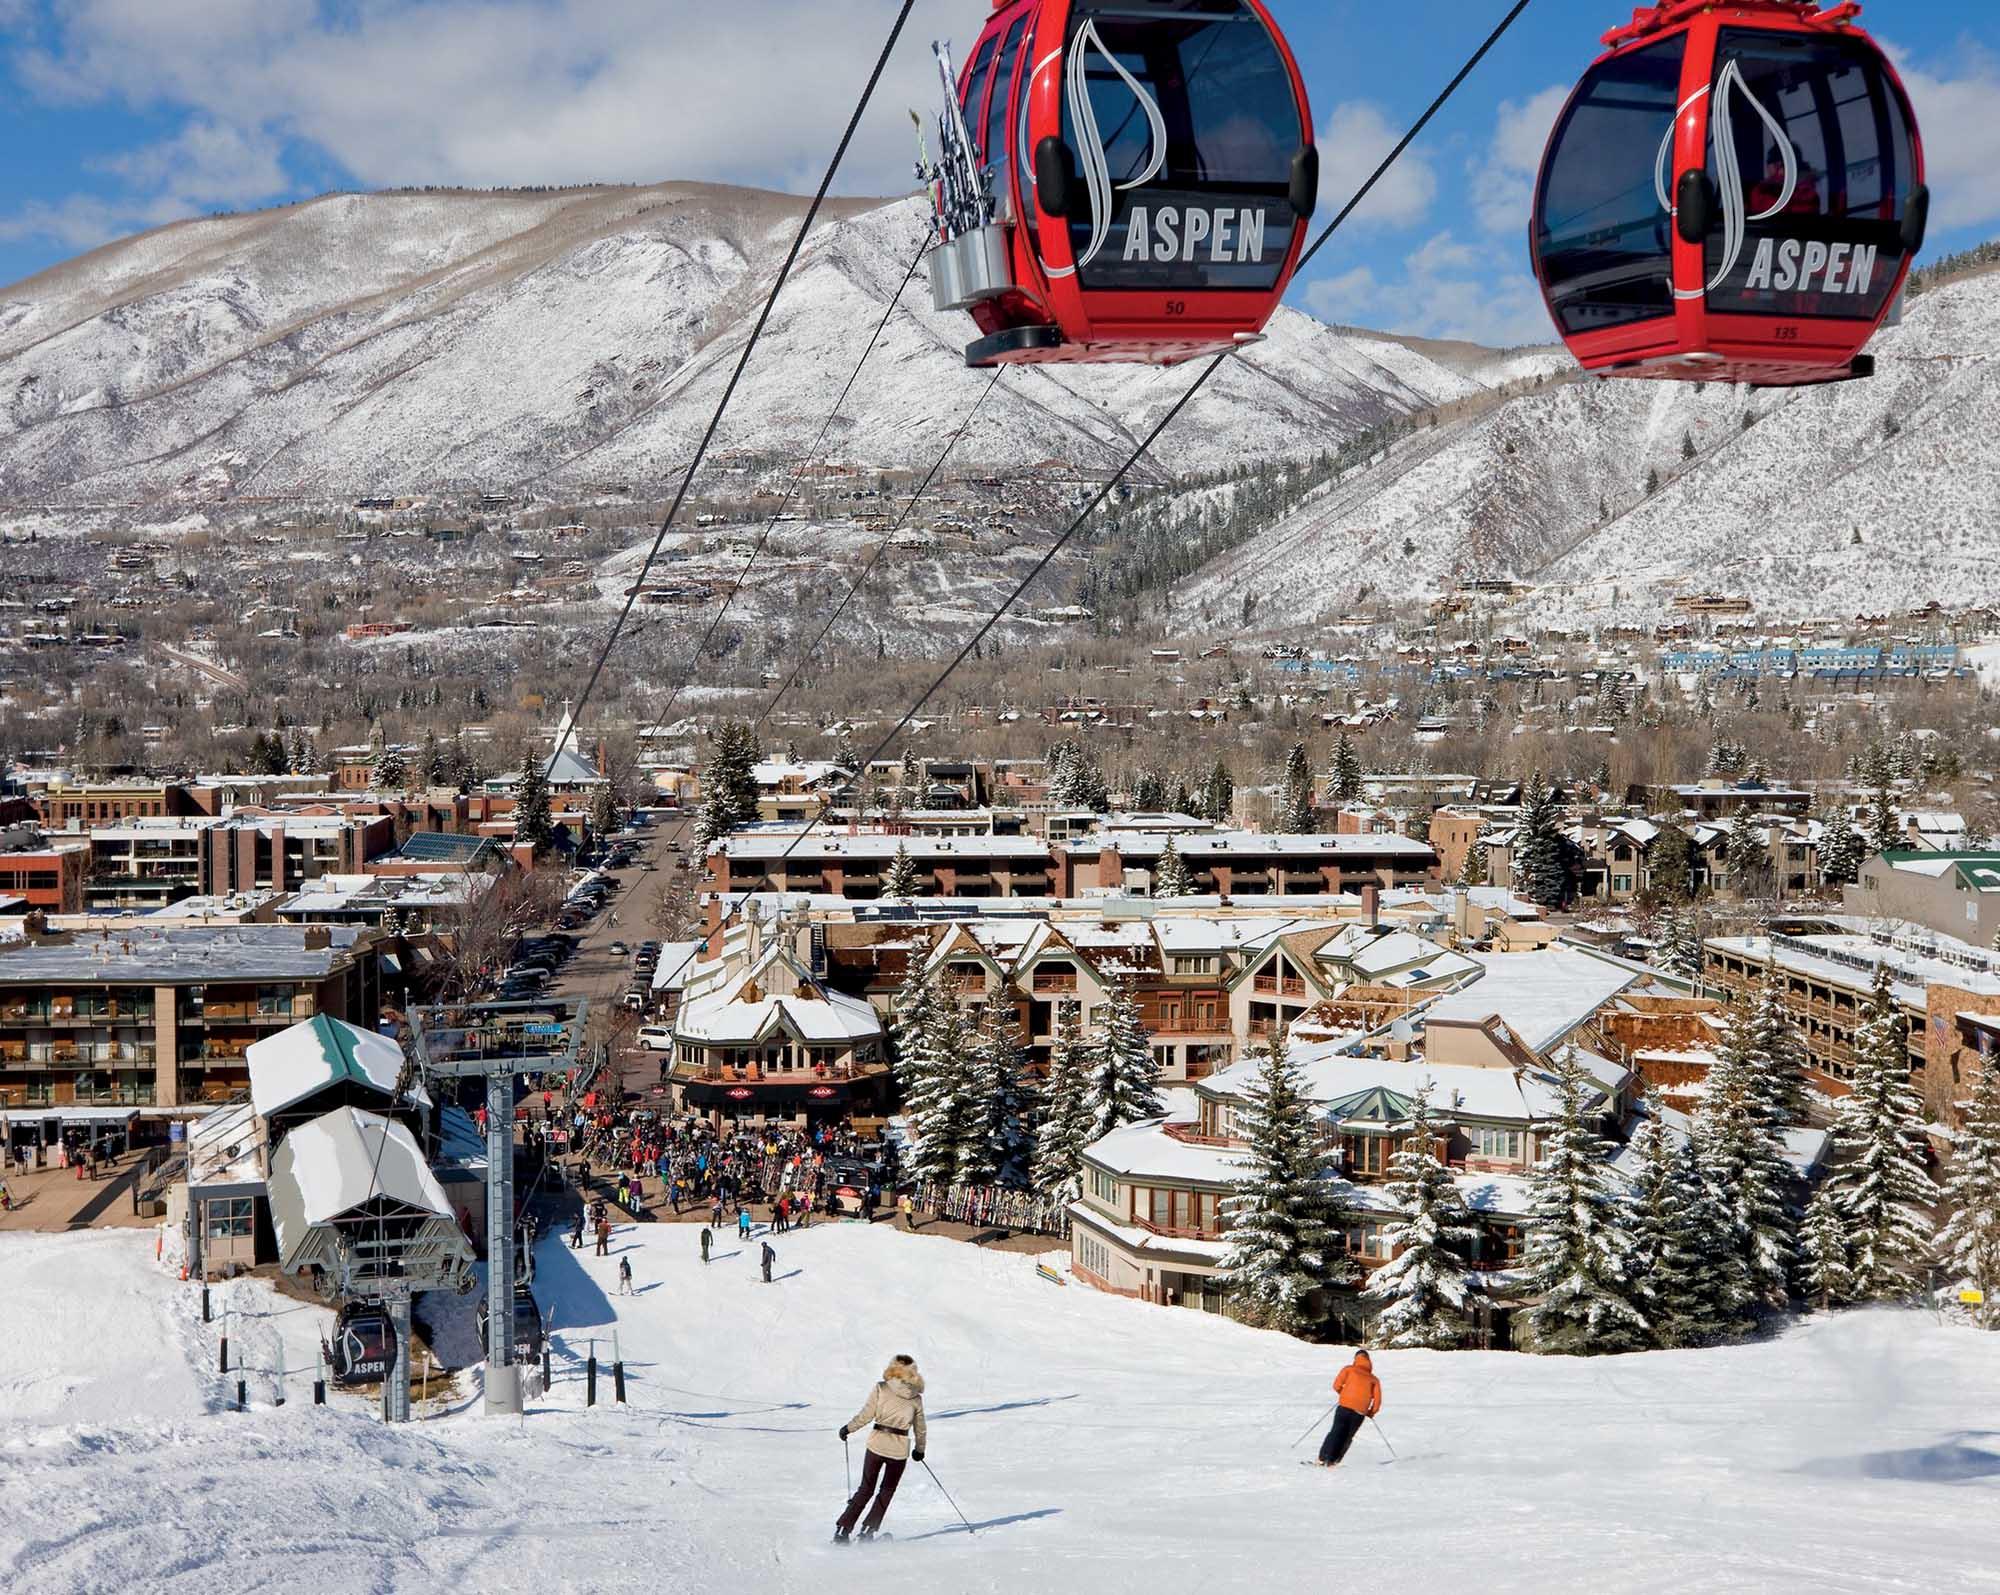 Aspen khu resort nổi tiếng